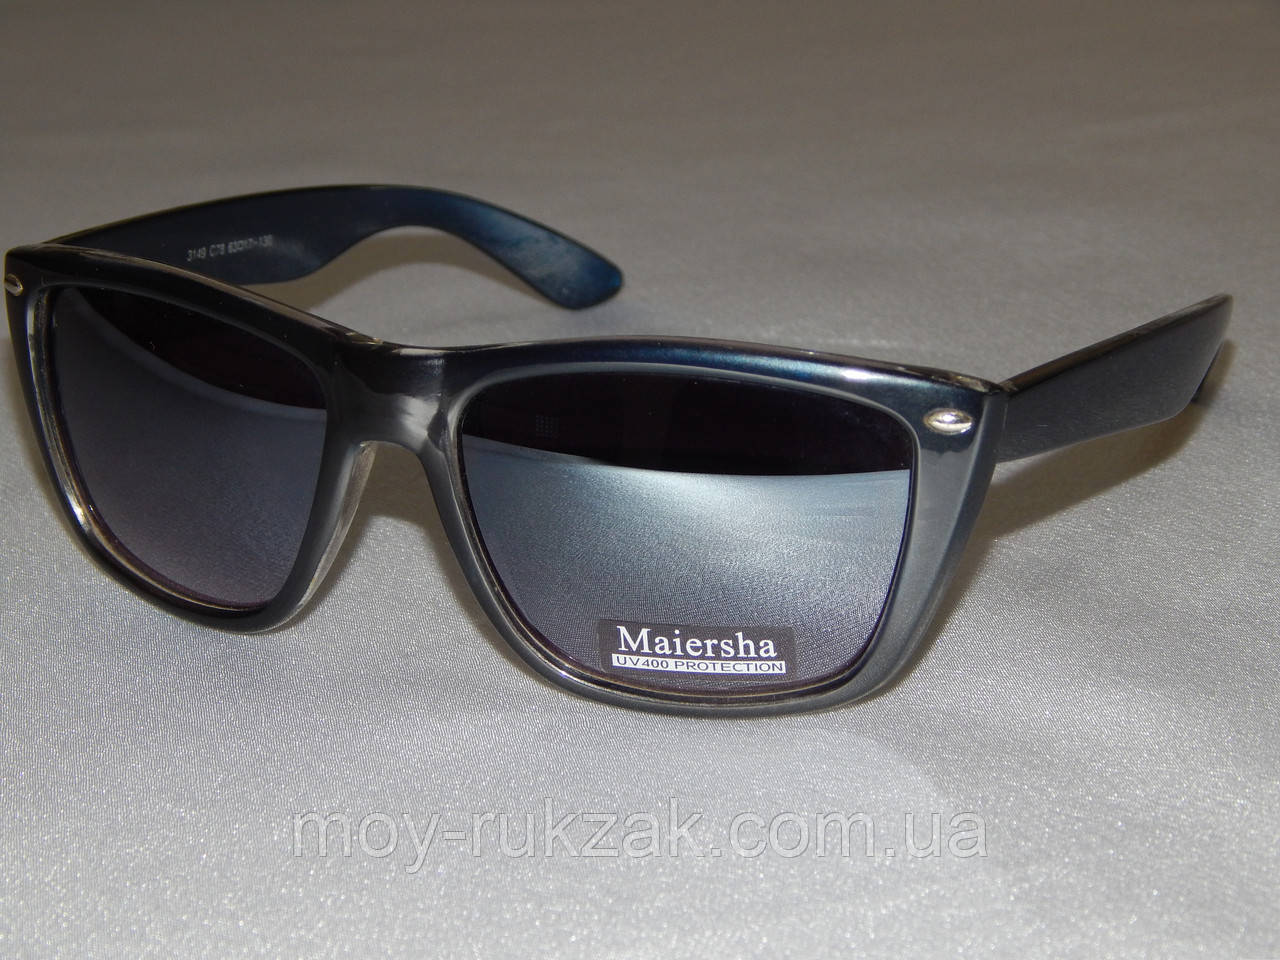 Солнцезащитные очки, Maiersha темно - синие 760130